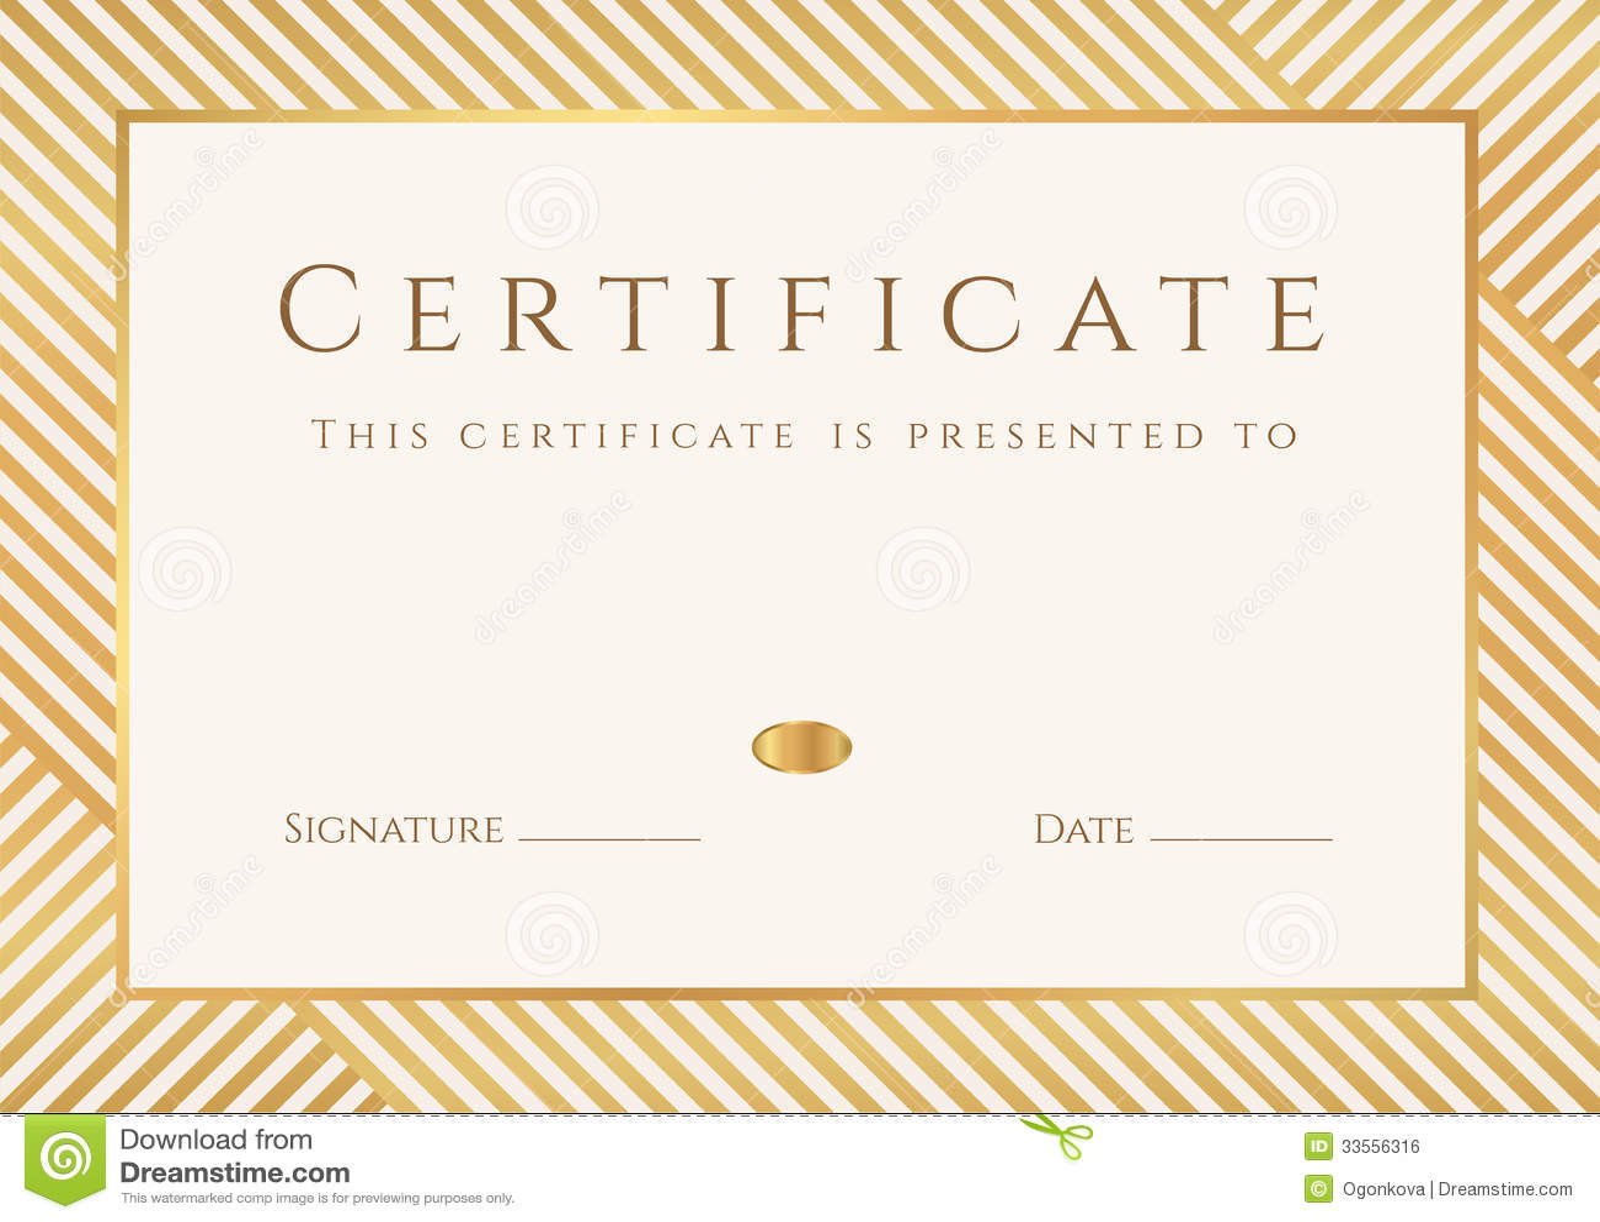 achievement award certificates templates